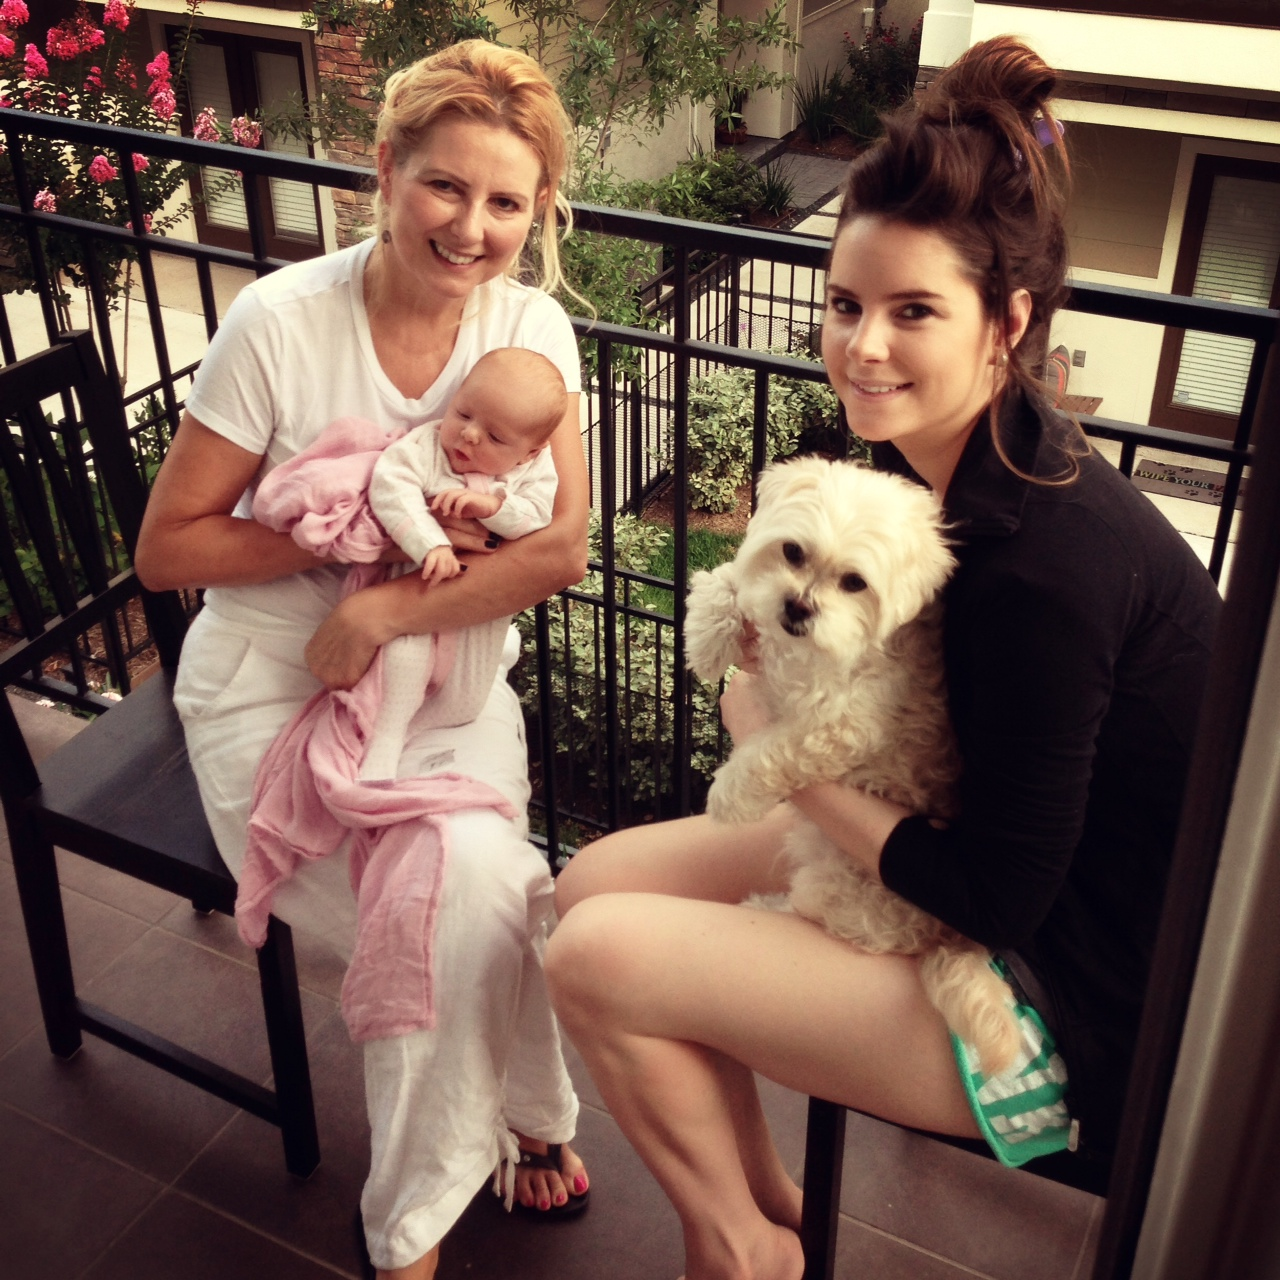 Veronika S Blushing Harper S Nursery Updated: Veronika's Blushing: Harper Meets Grandma